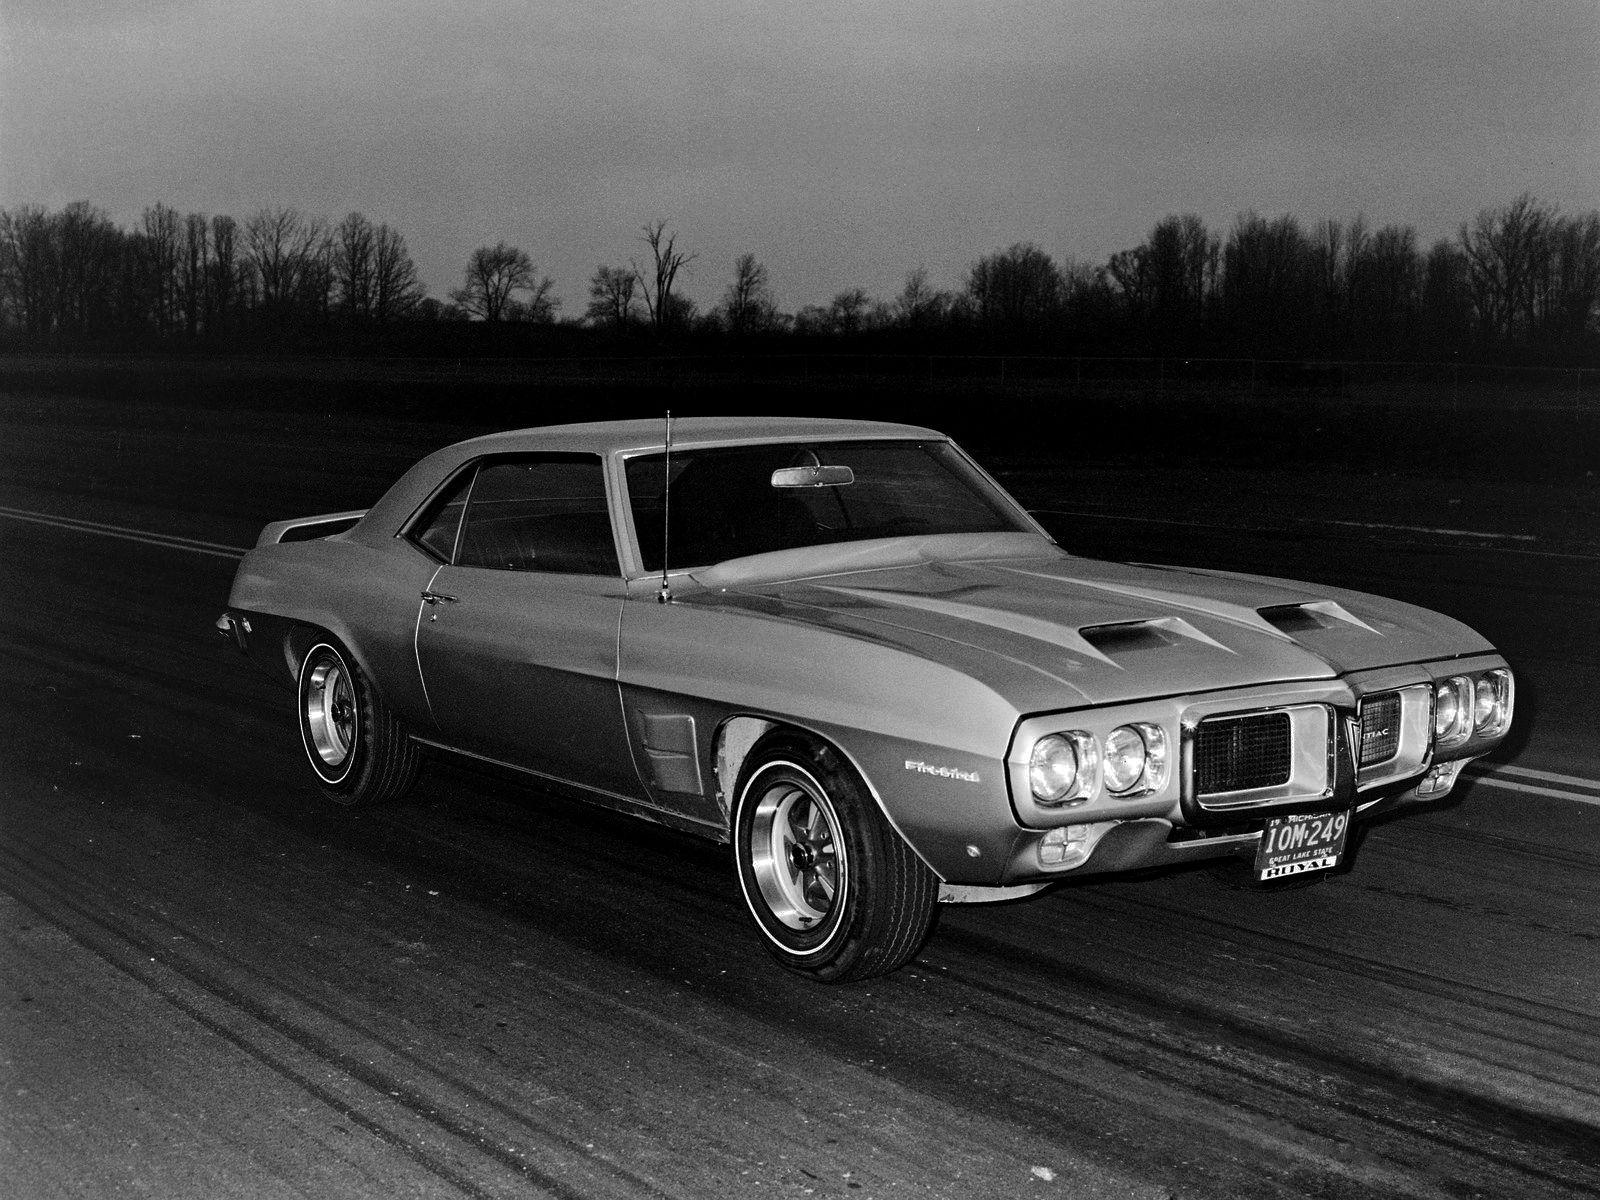 1969 pontiac firebird trans am prototype